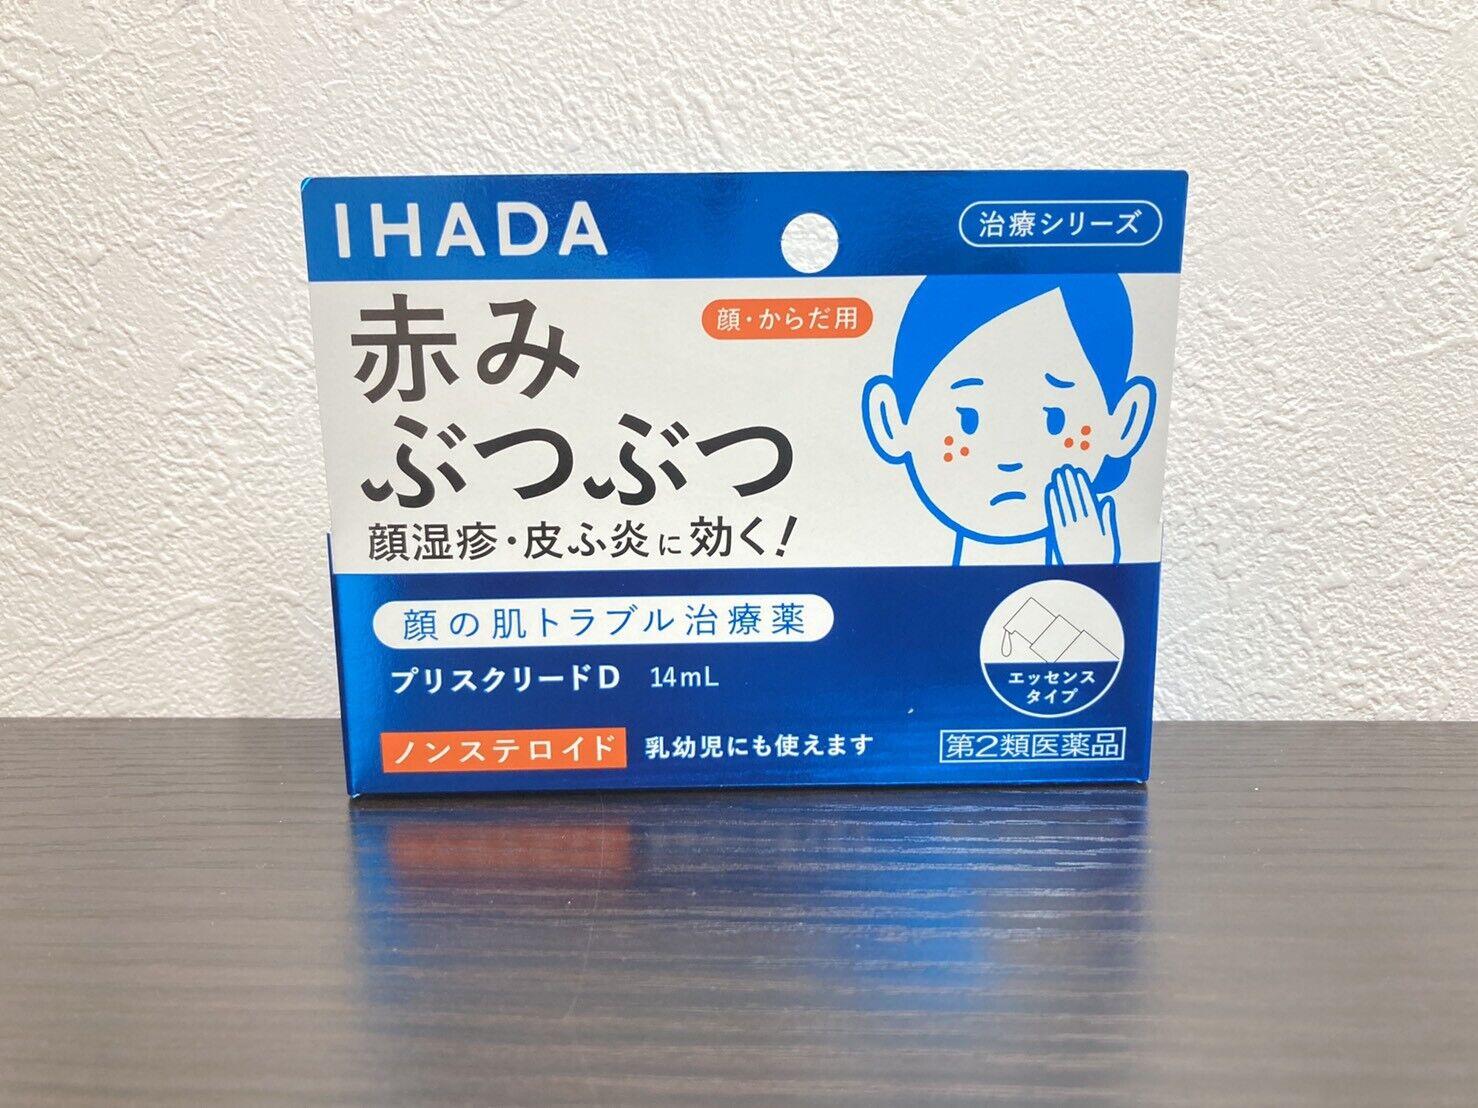 Shiseido IHADA Prescreed D Essence 14ml skin inflammation, e